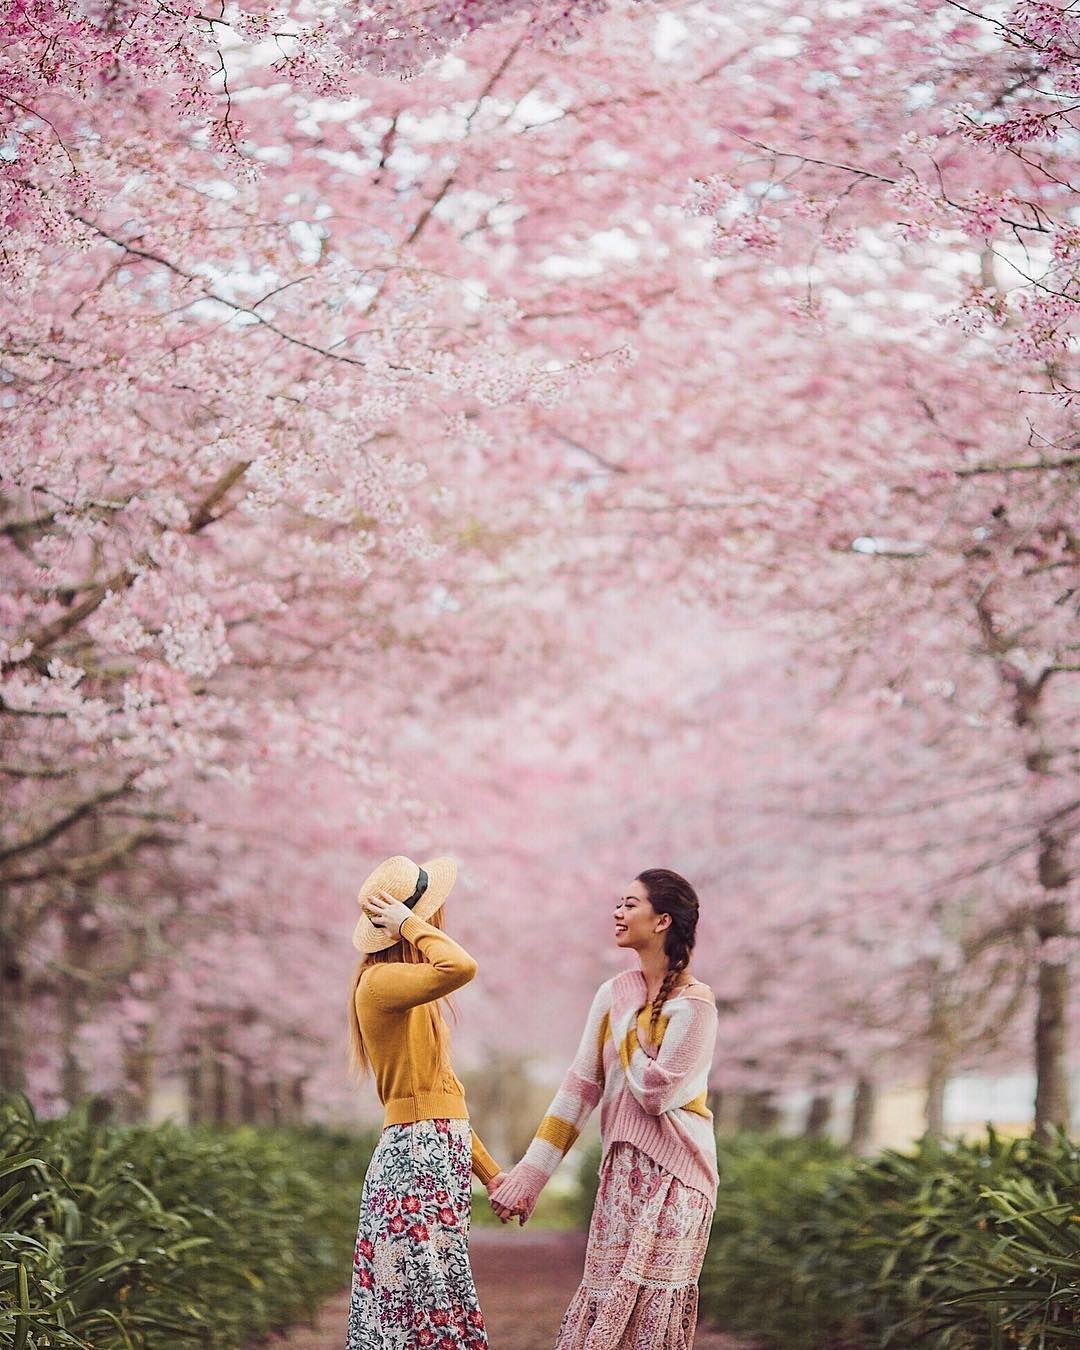 18 6k Likes 224 Comments Tara Milk Tea Taramilktea On Instagram Back At Our Favourite Tara Milk Tea Cherry Blossom Pictures Cherry Blossom Outfit